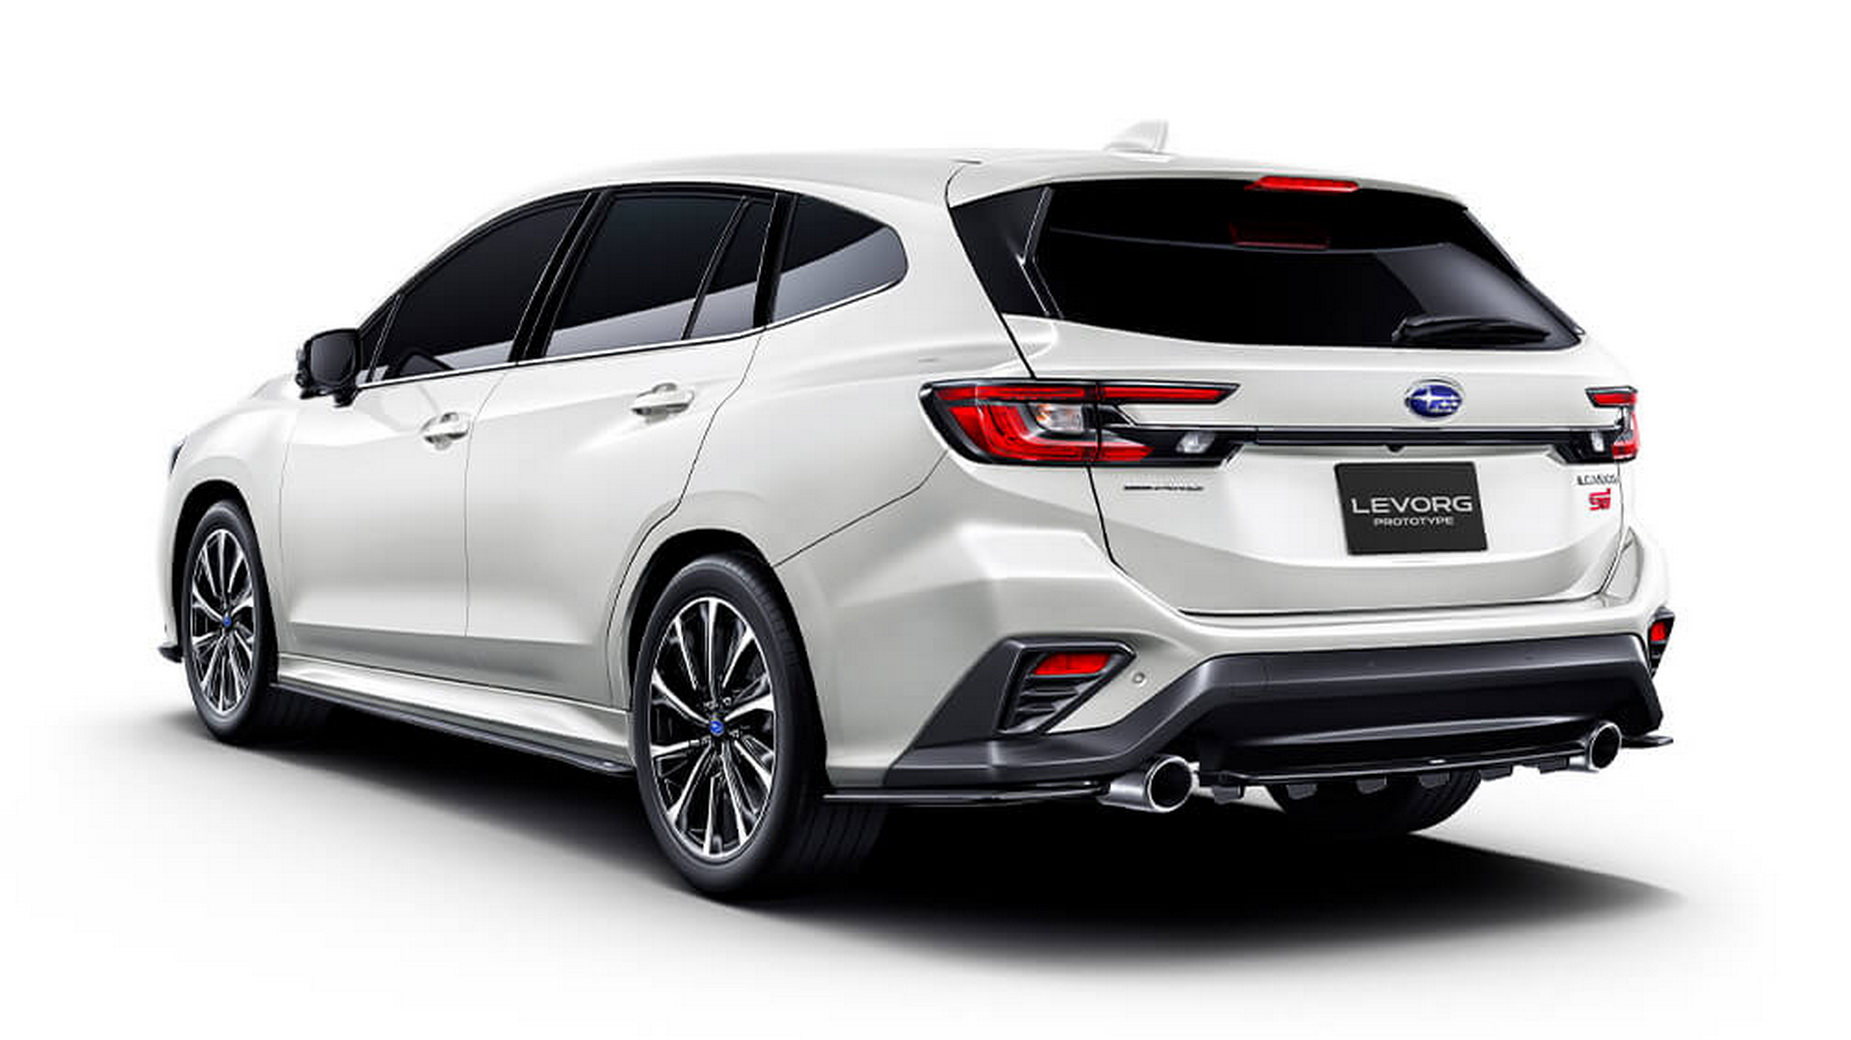 Subaru Levorg Prototype Sti Sport 2020 (3)